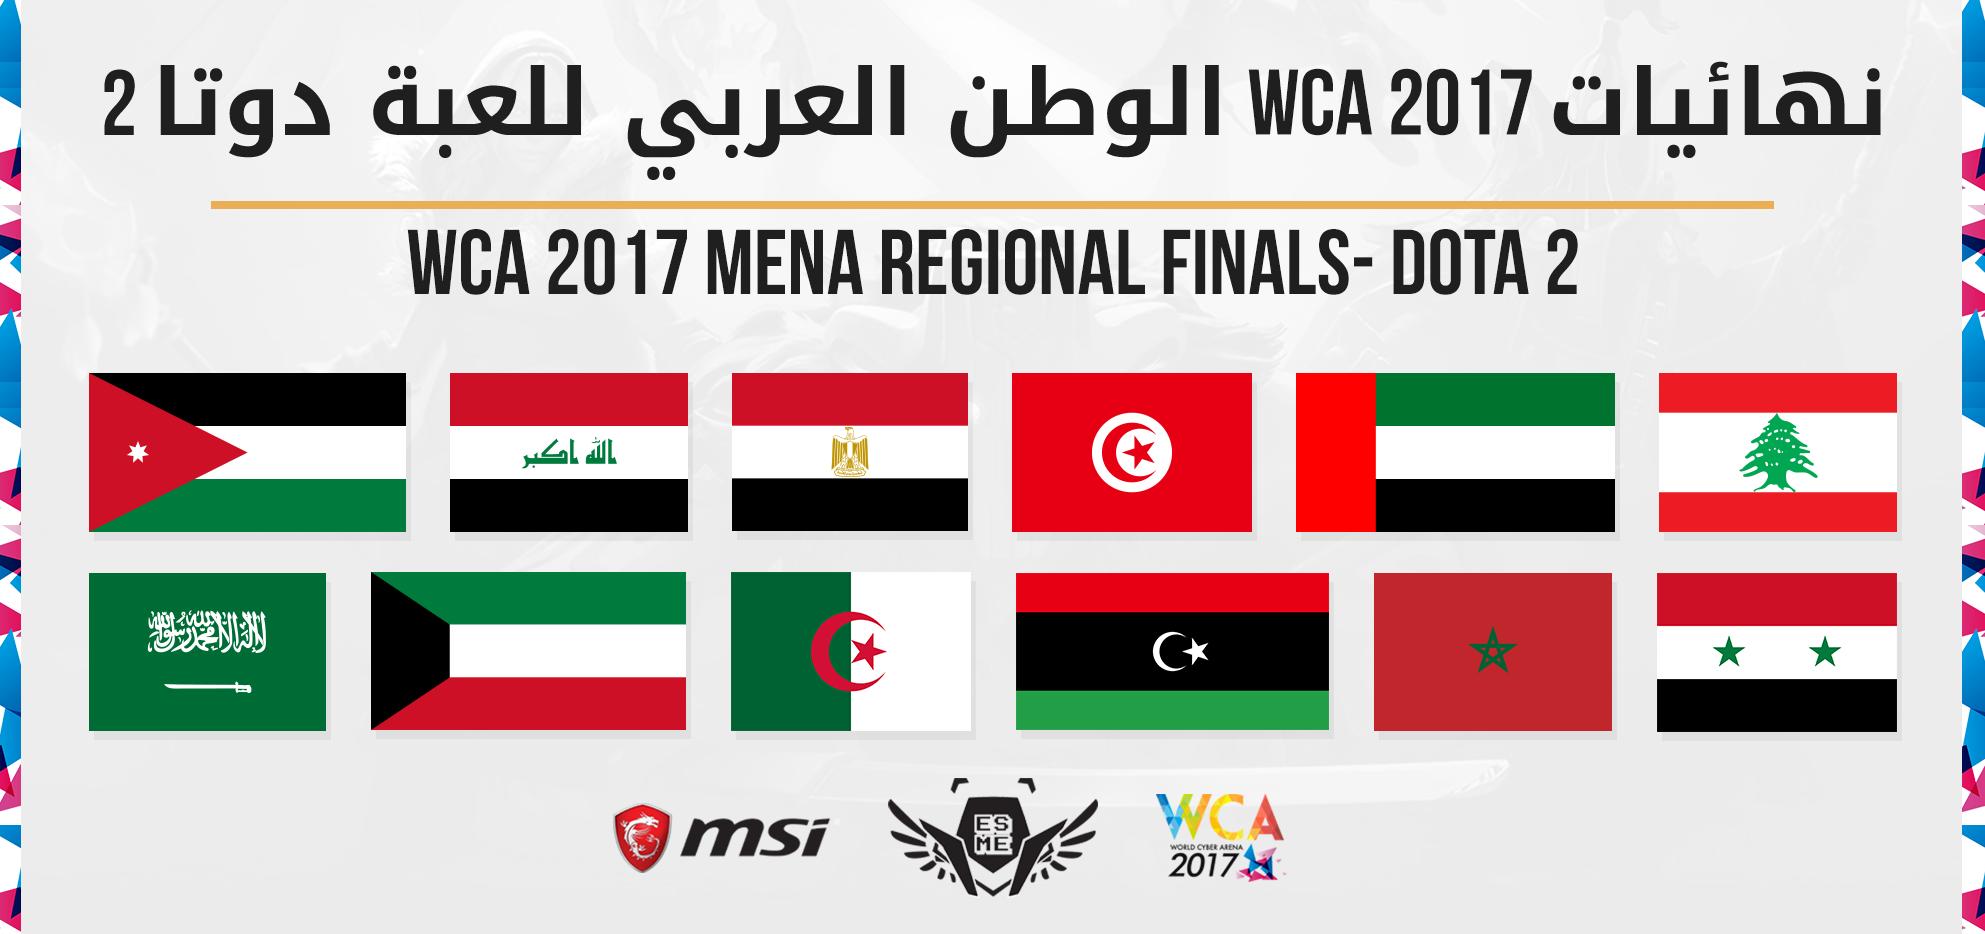 WCA 2017 Mena Dota 2 qualifiers